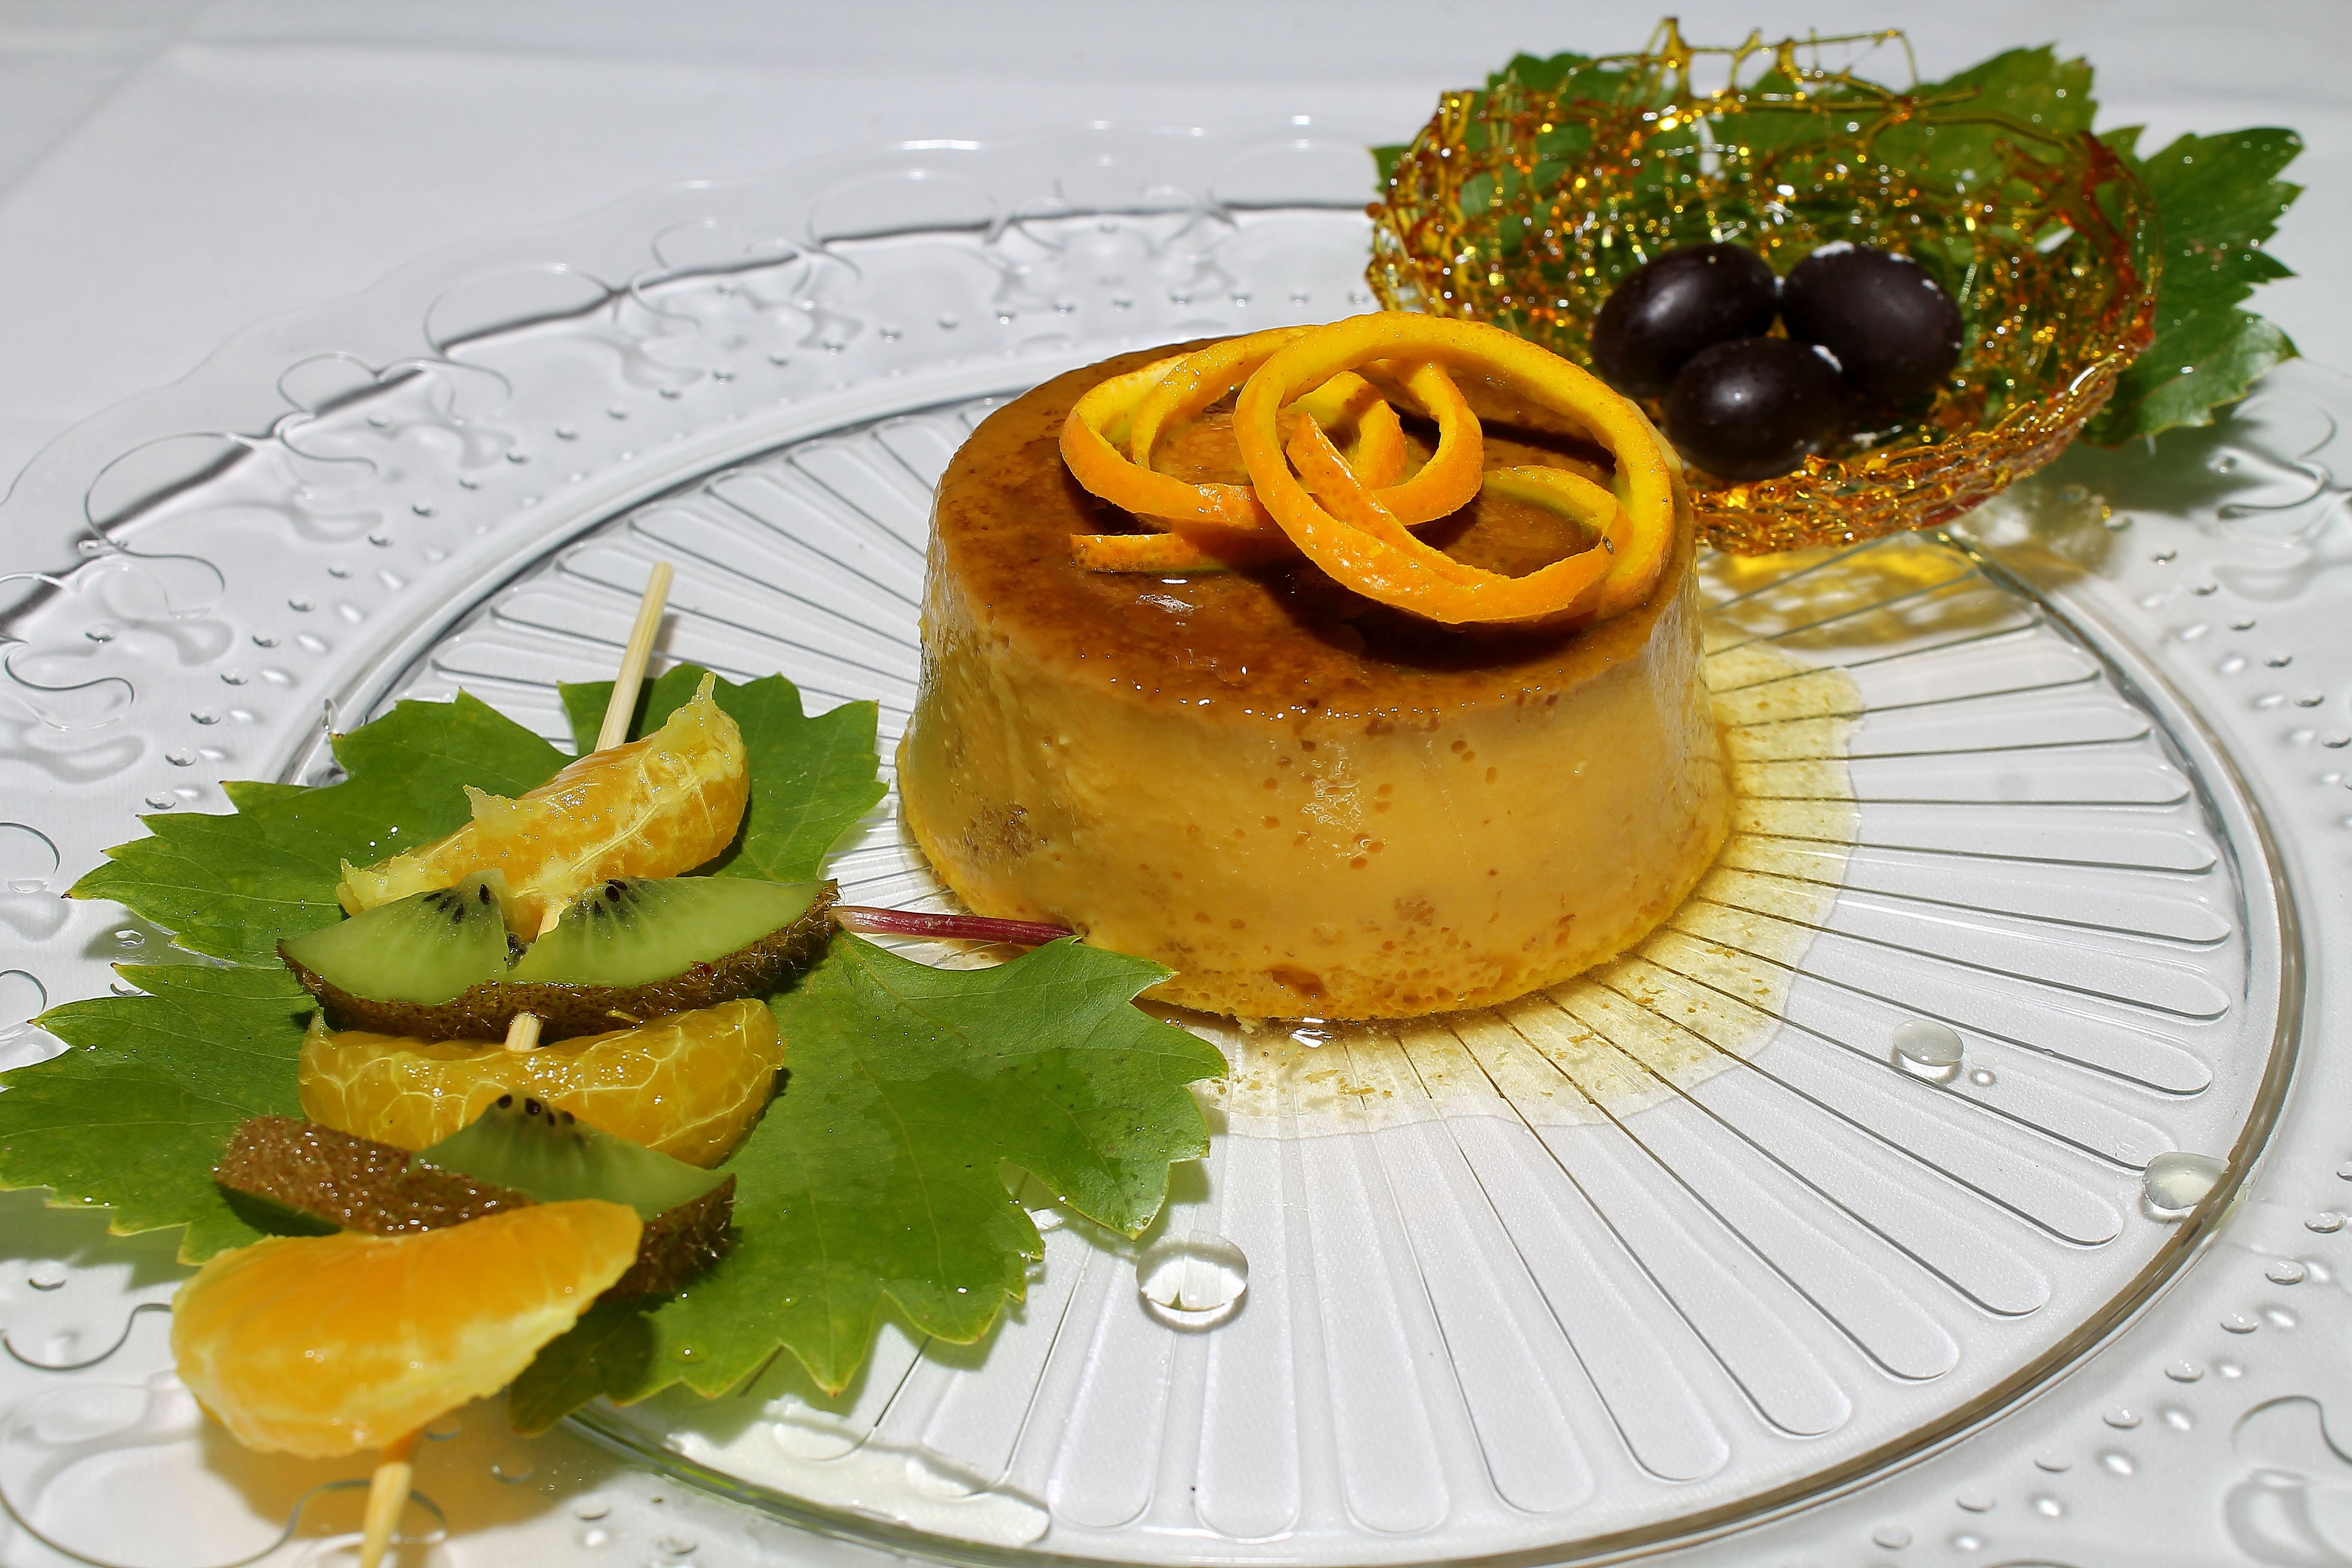 Comida mediterránea y postres caseros en Tetuán, Madrid